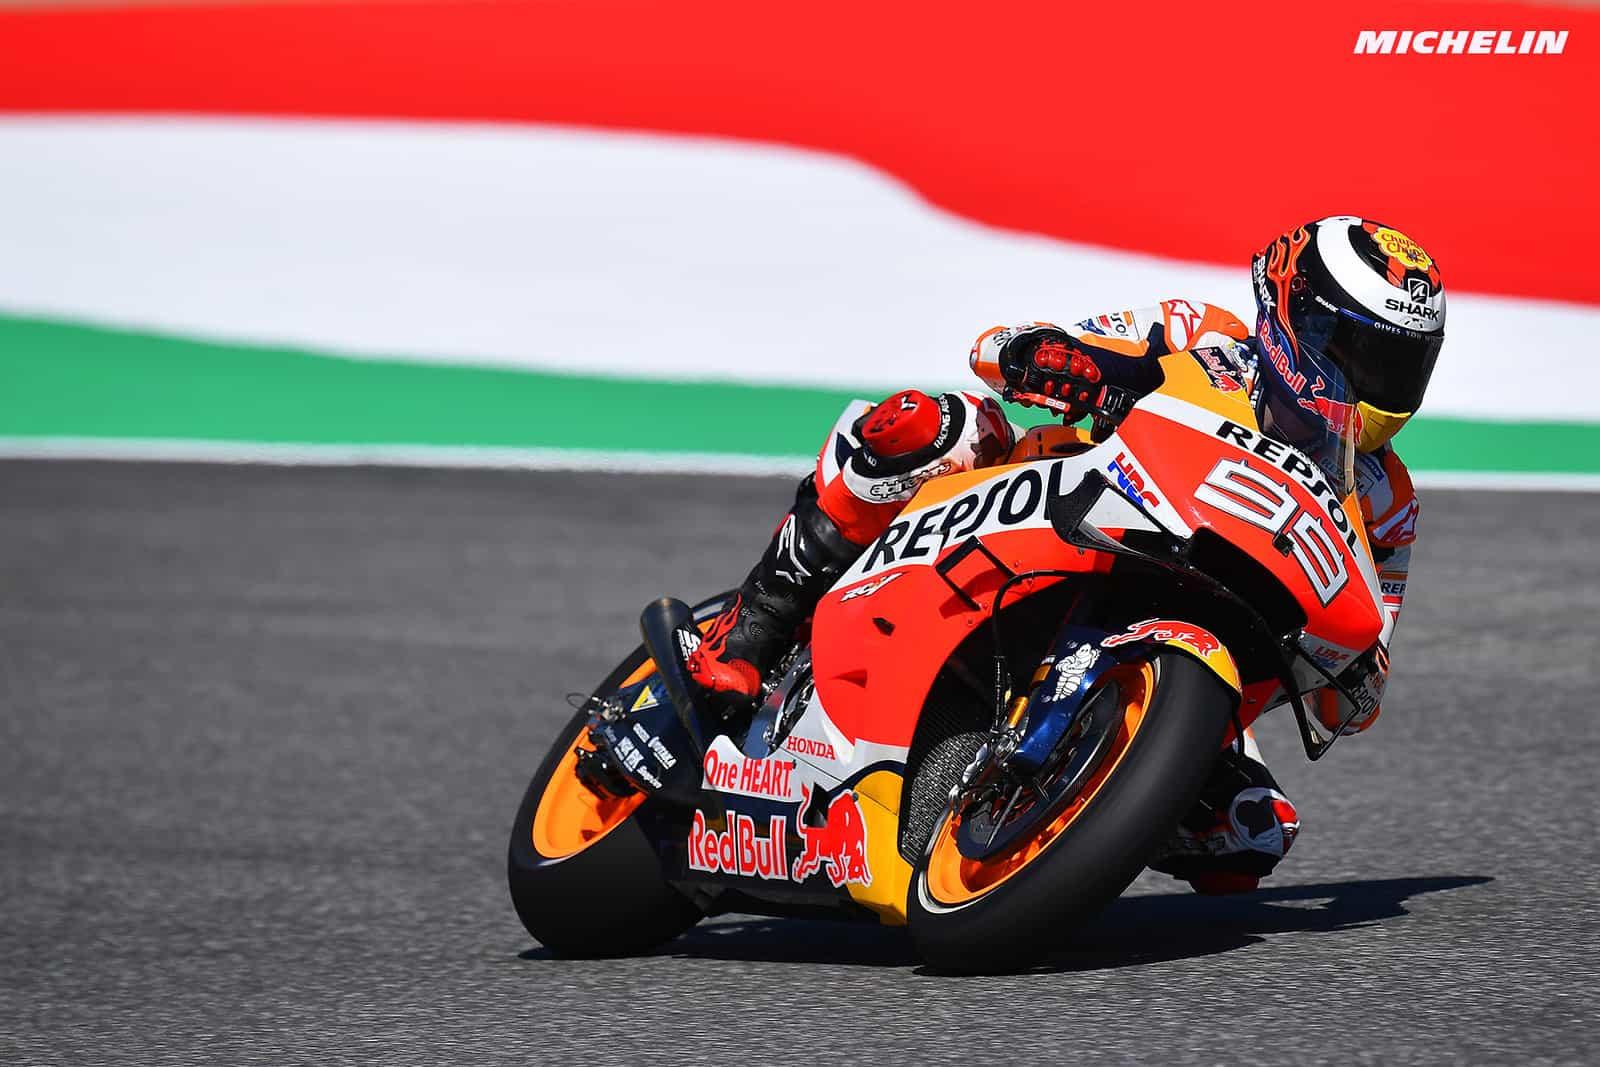 MotoGP2019カタルーニャGP ホルへ・ロレンソ「日本で試した内容は、今週末そして今後役立ってくれる」